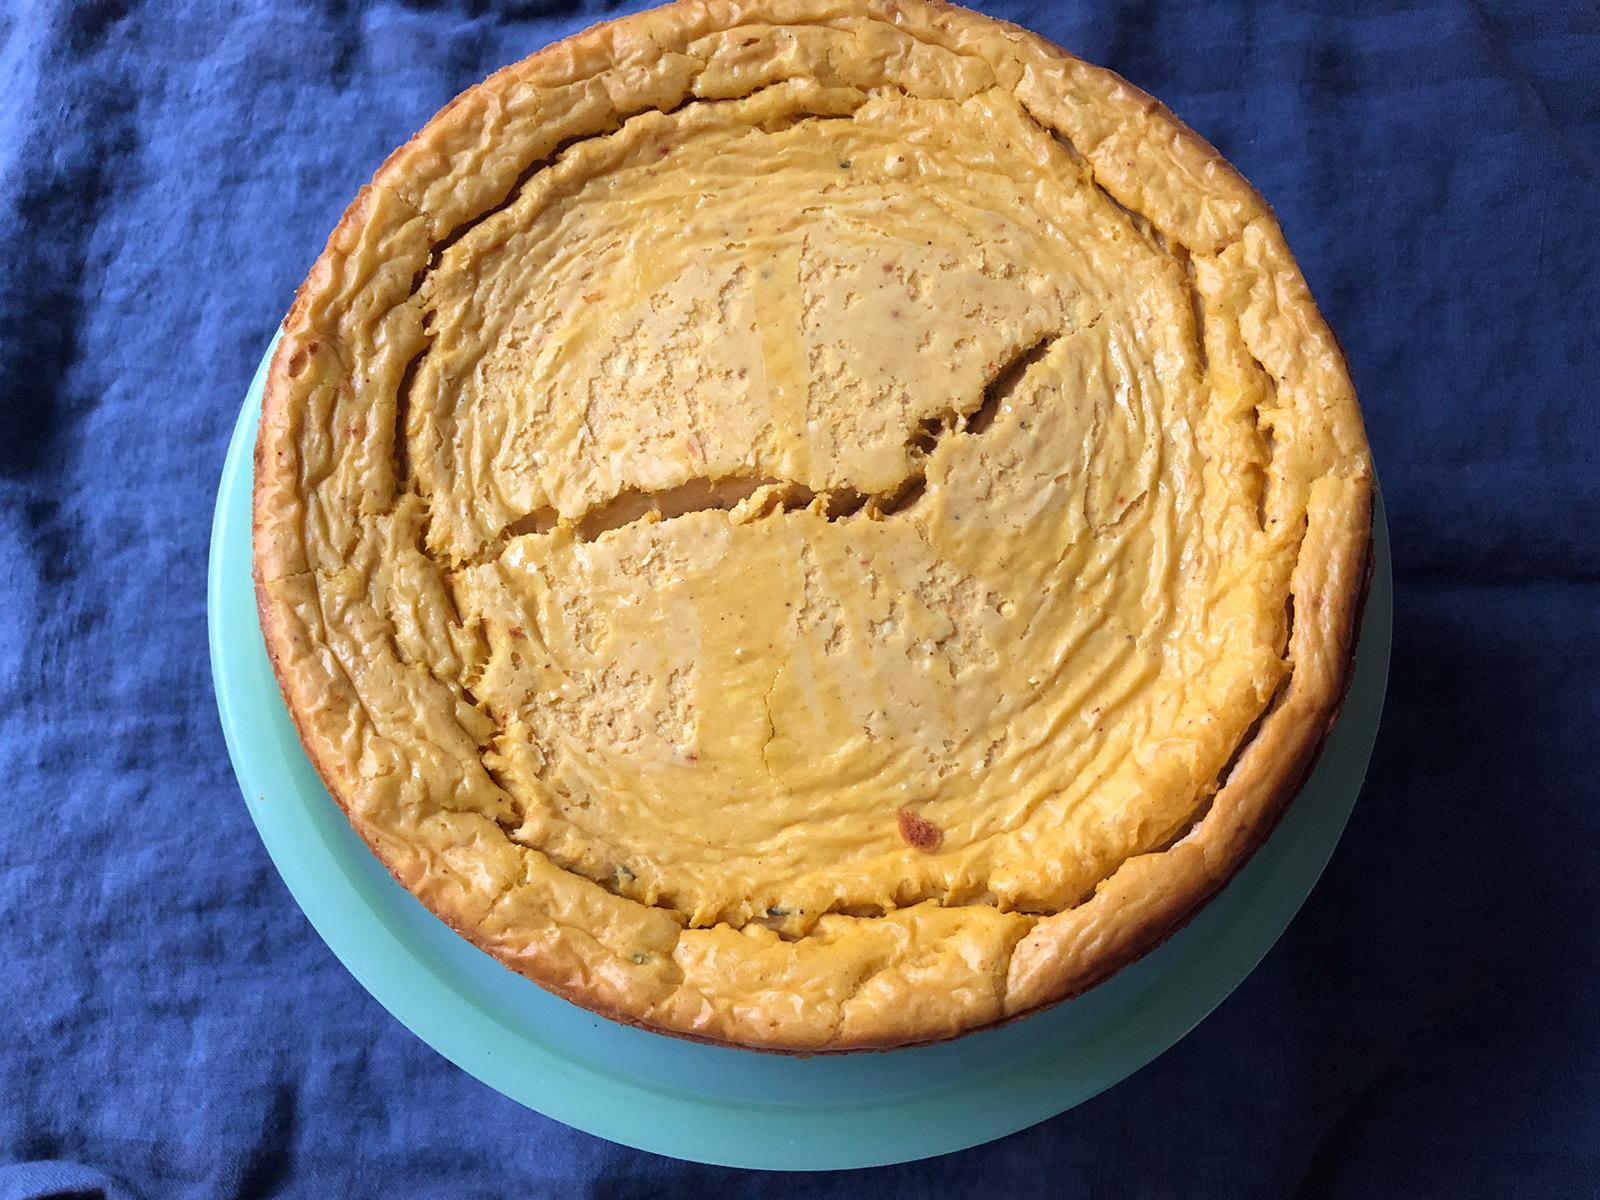 Savory Pumpkin Cheesecake Is Like a Little Miracle